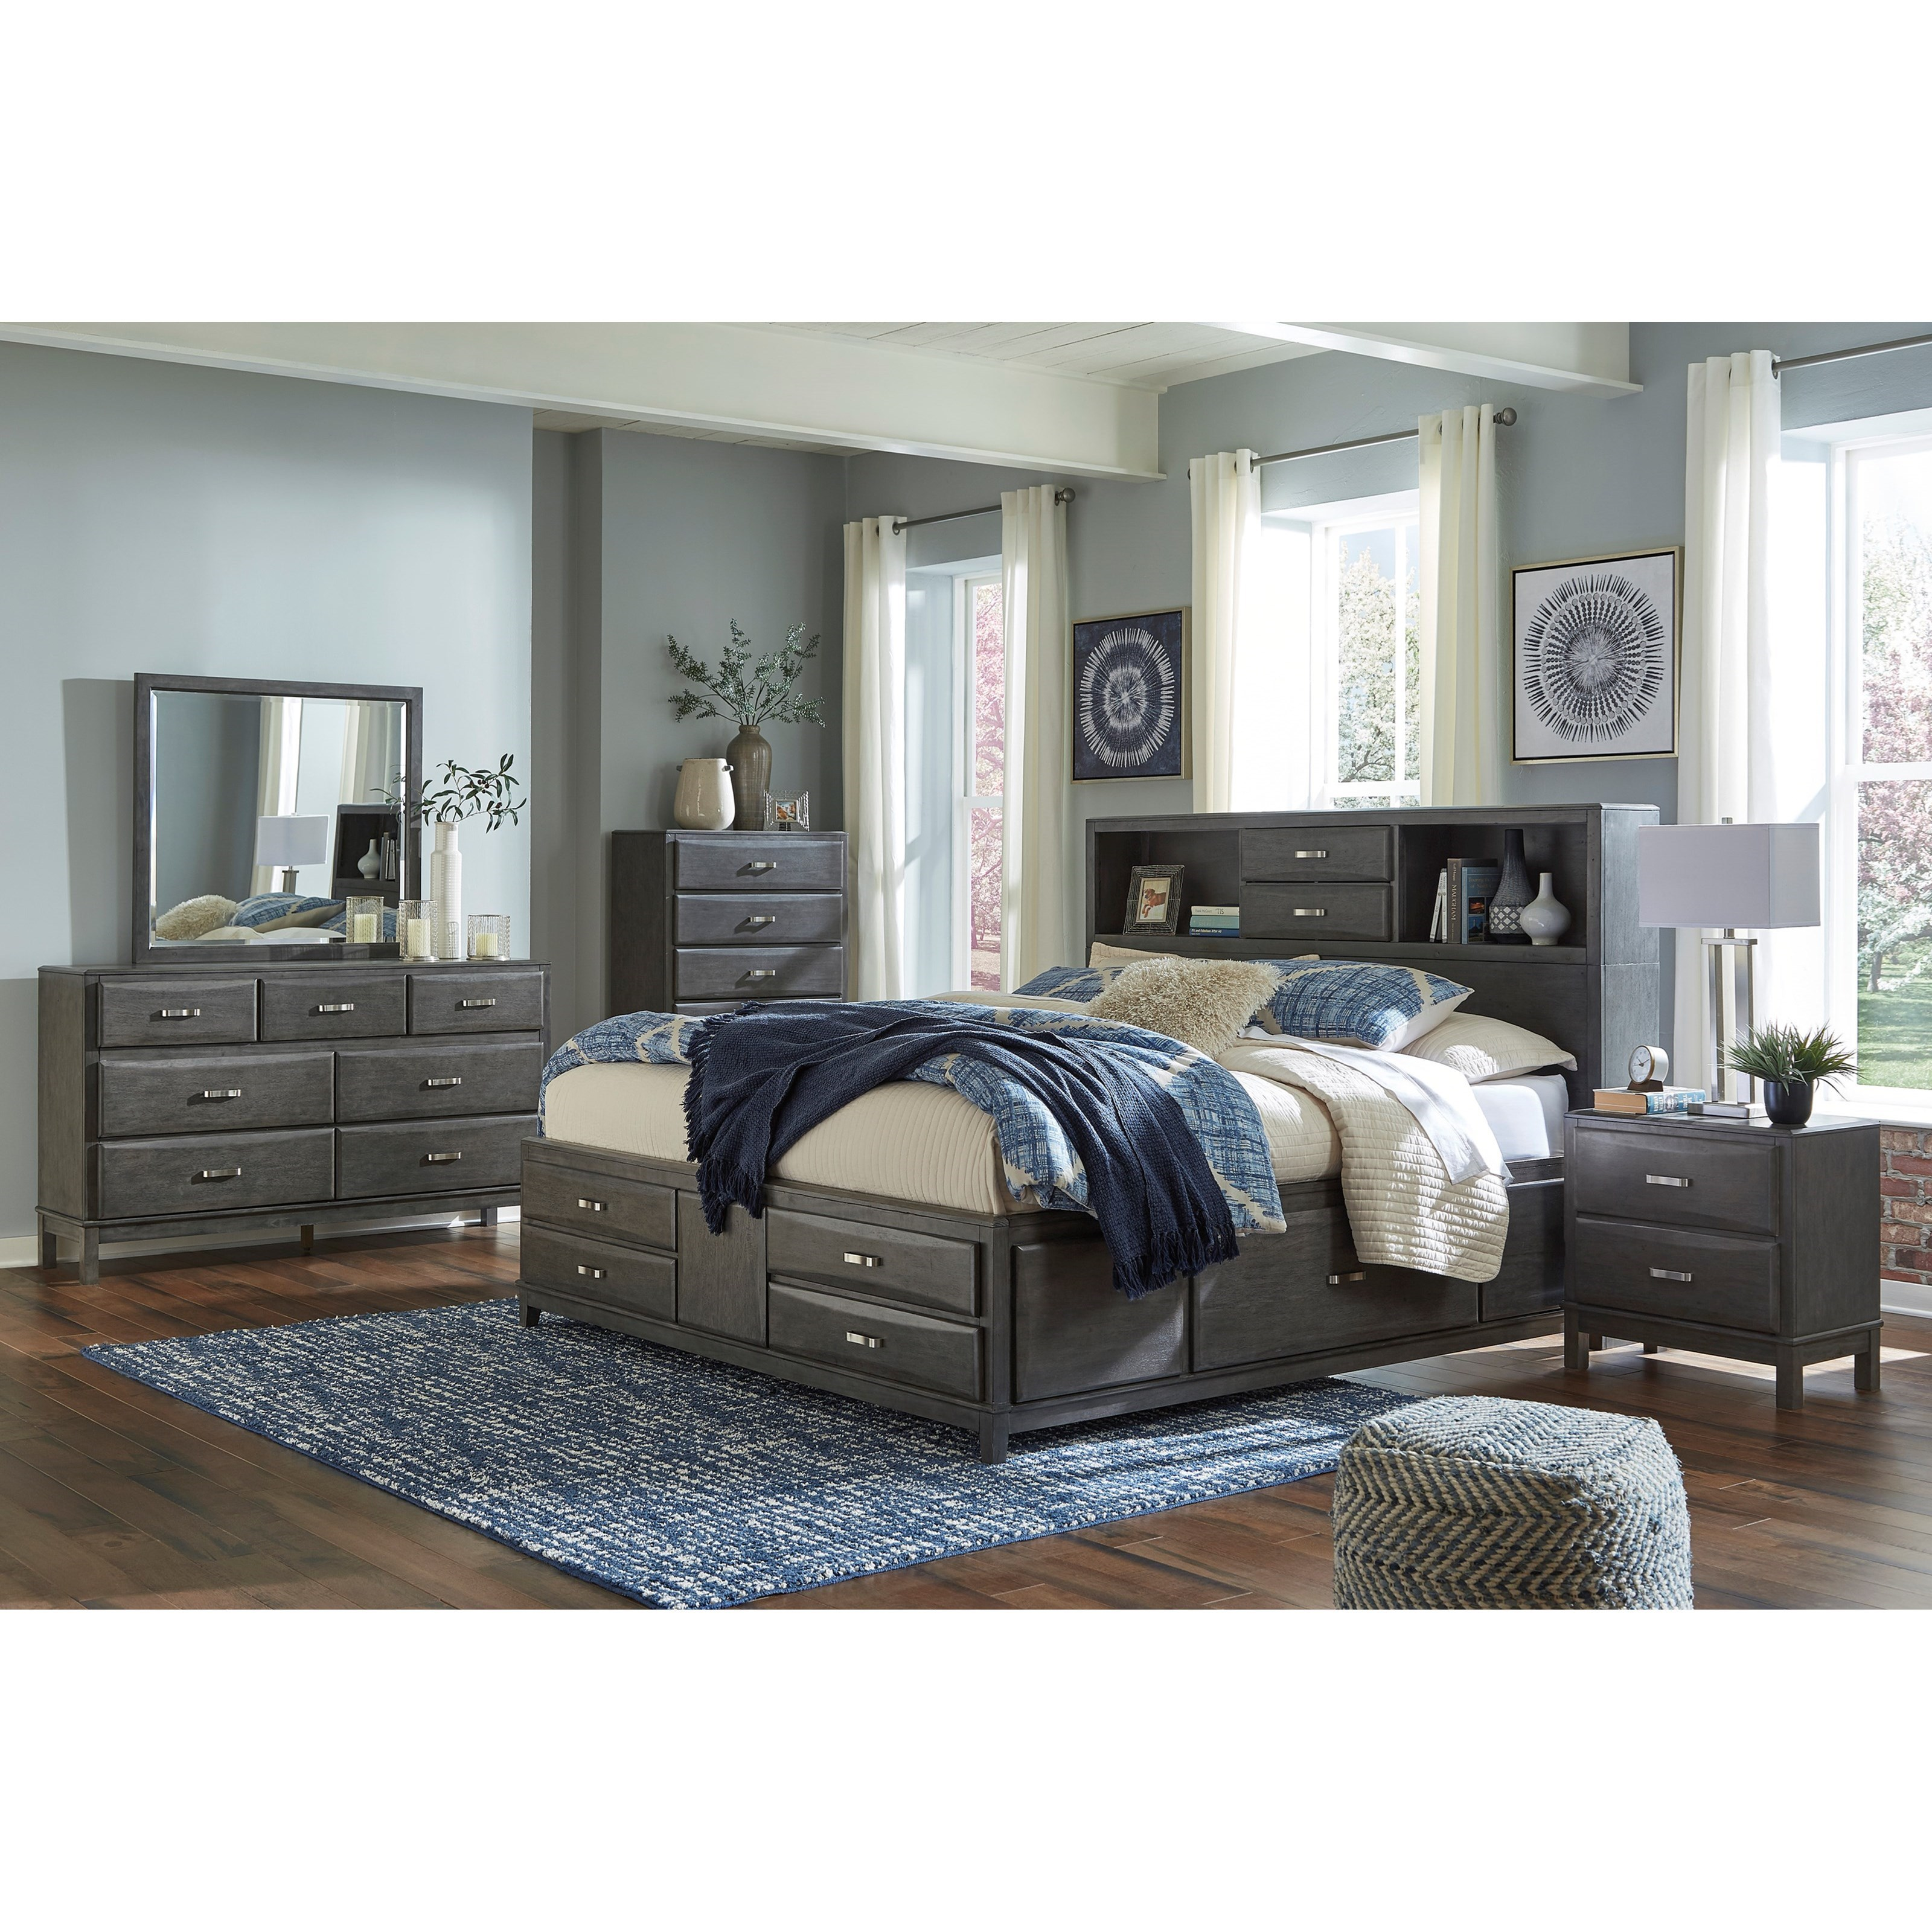 Ashley Furniture Kira 7 Drawer Dresser: Ashley Signature Design Caitbrook 7-Drawer Dresser And